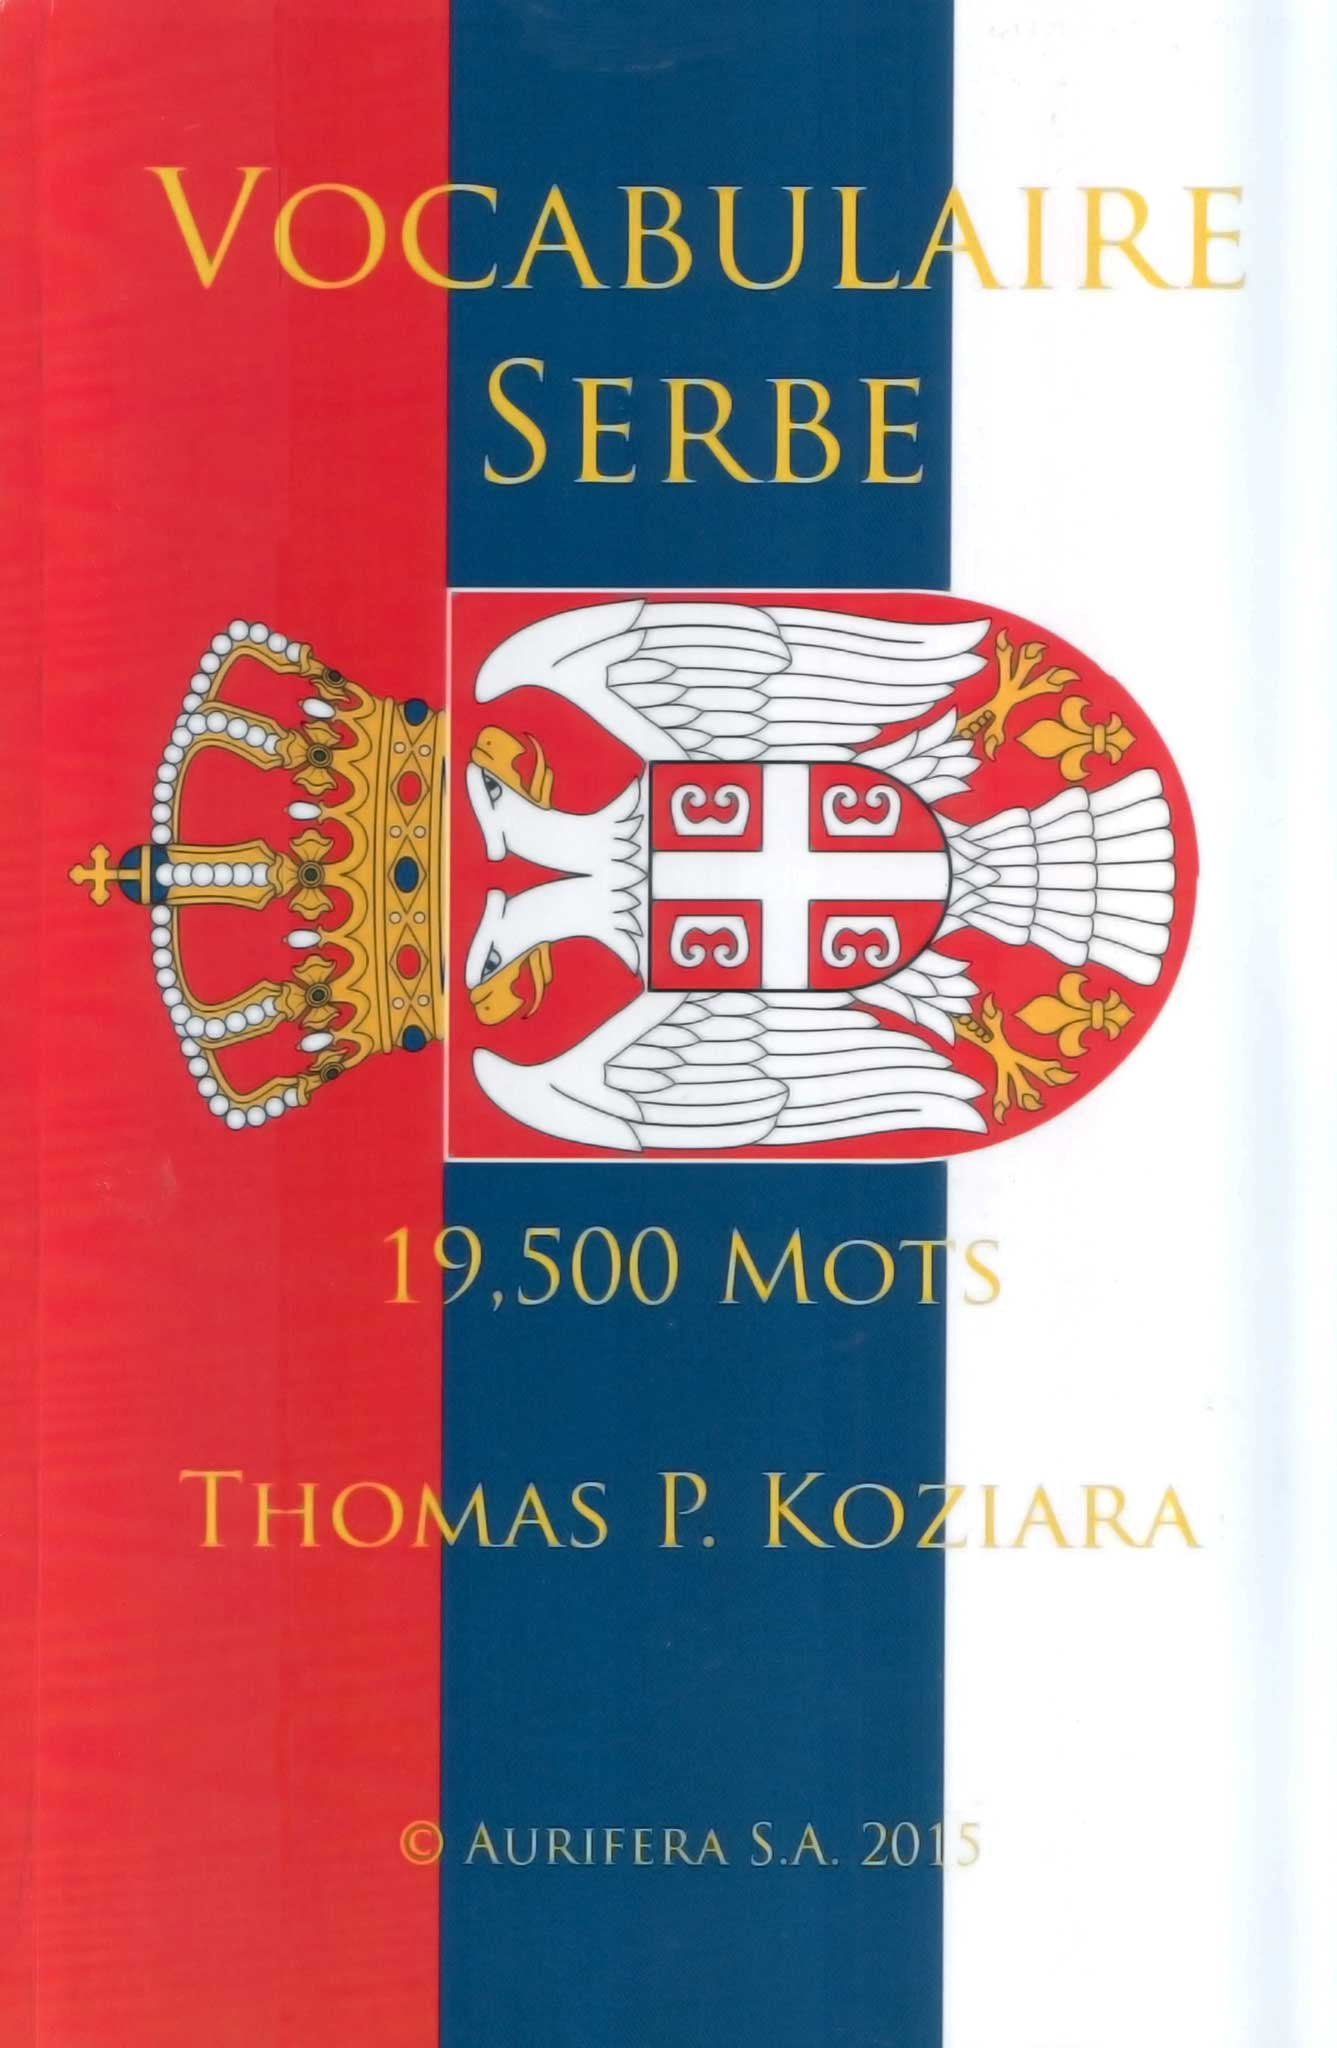 Vocabulaire Serbe 🇸🇷 19'500 mots  Thomas P. Koziara © Aurifera SA 2015